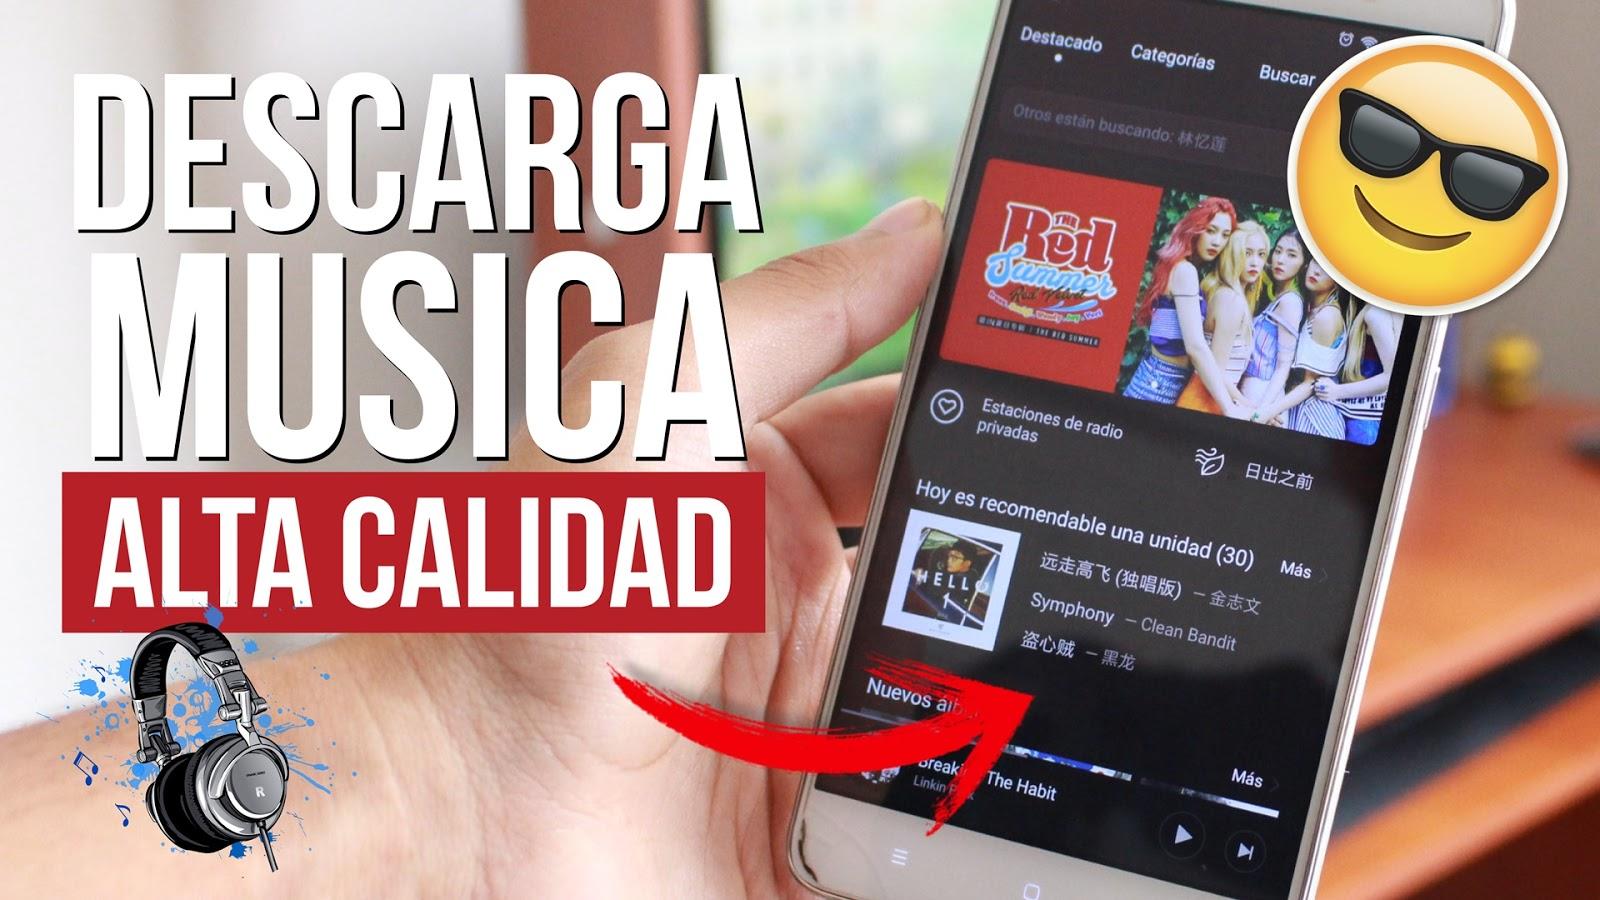 como descargar musica original gratis en android